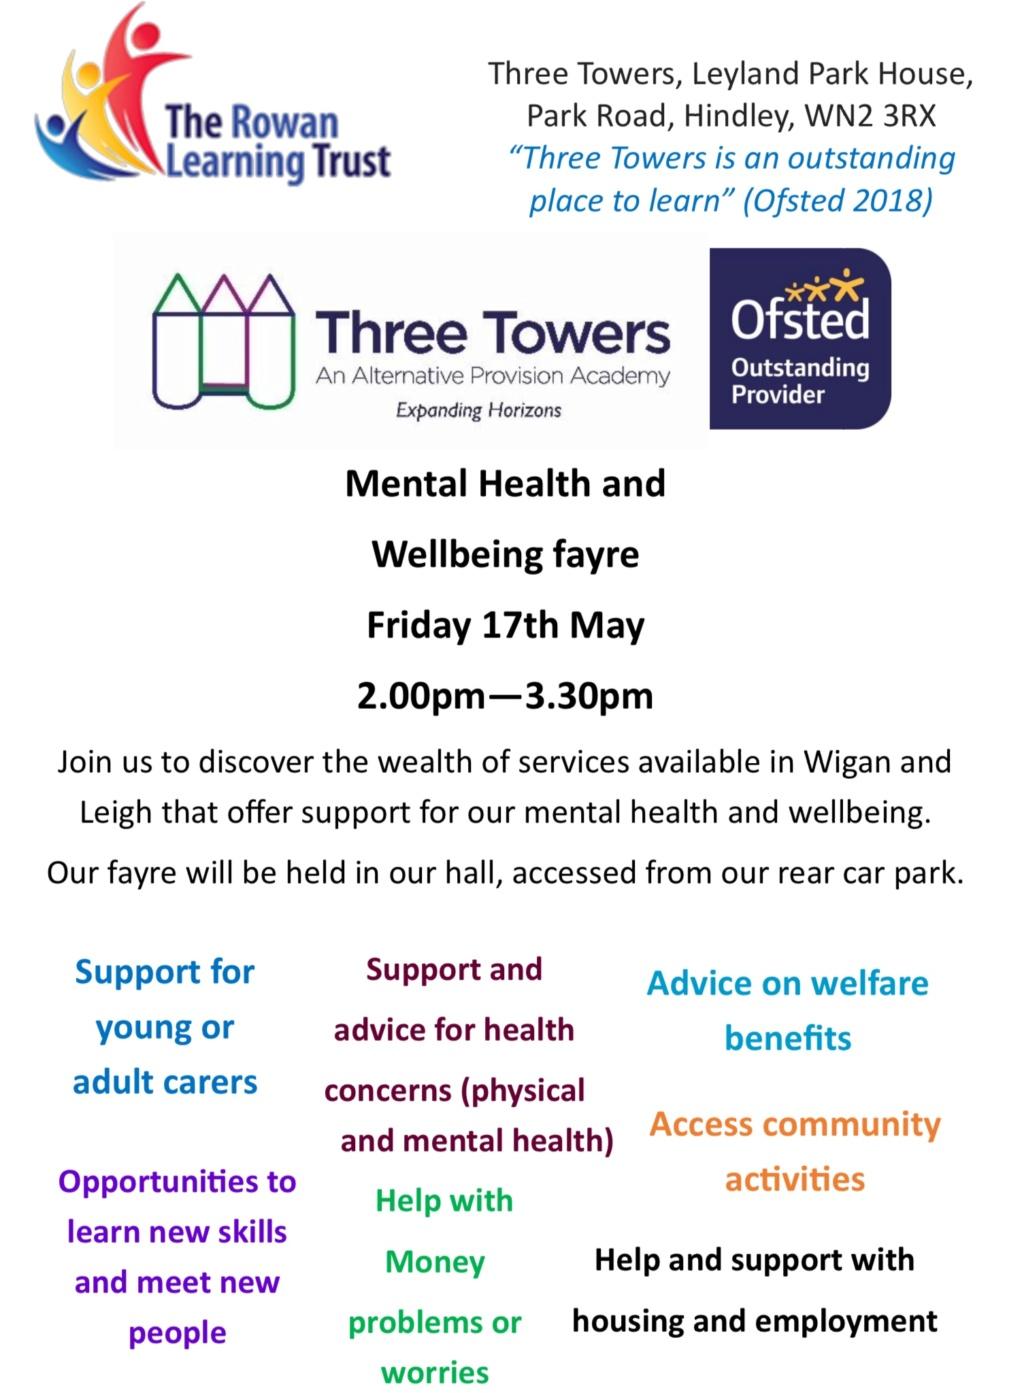 Mental Health & Wellbeing Fair, 17th May 9fdc8710